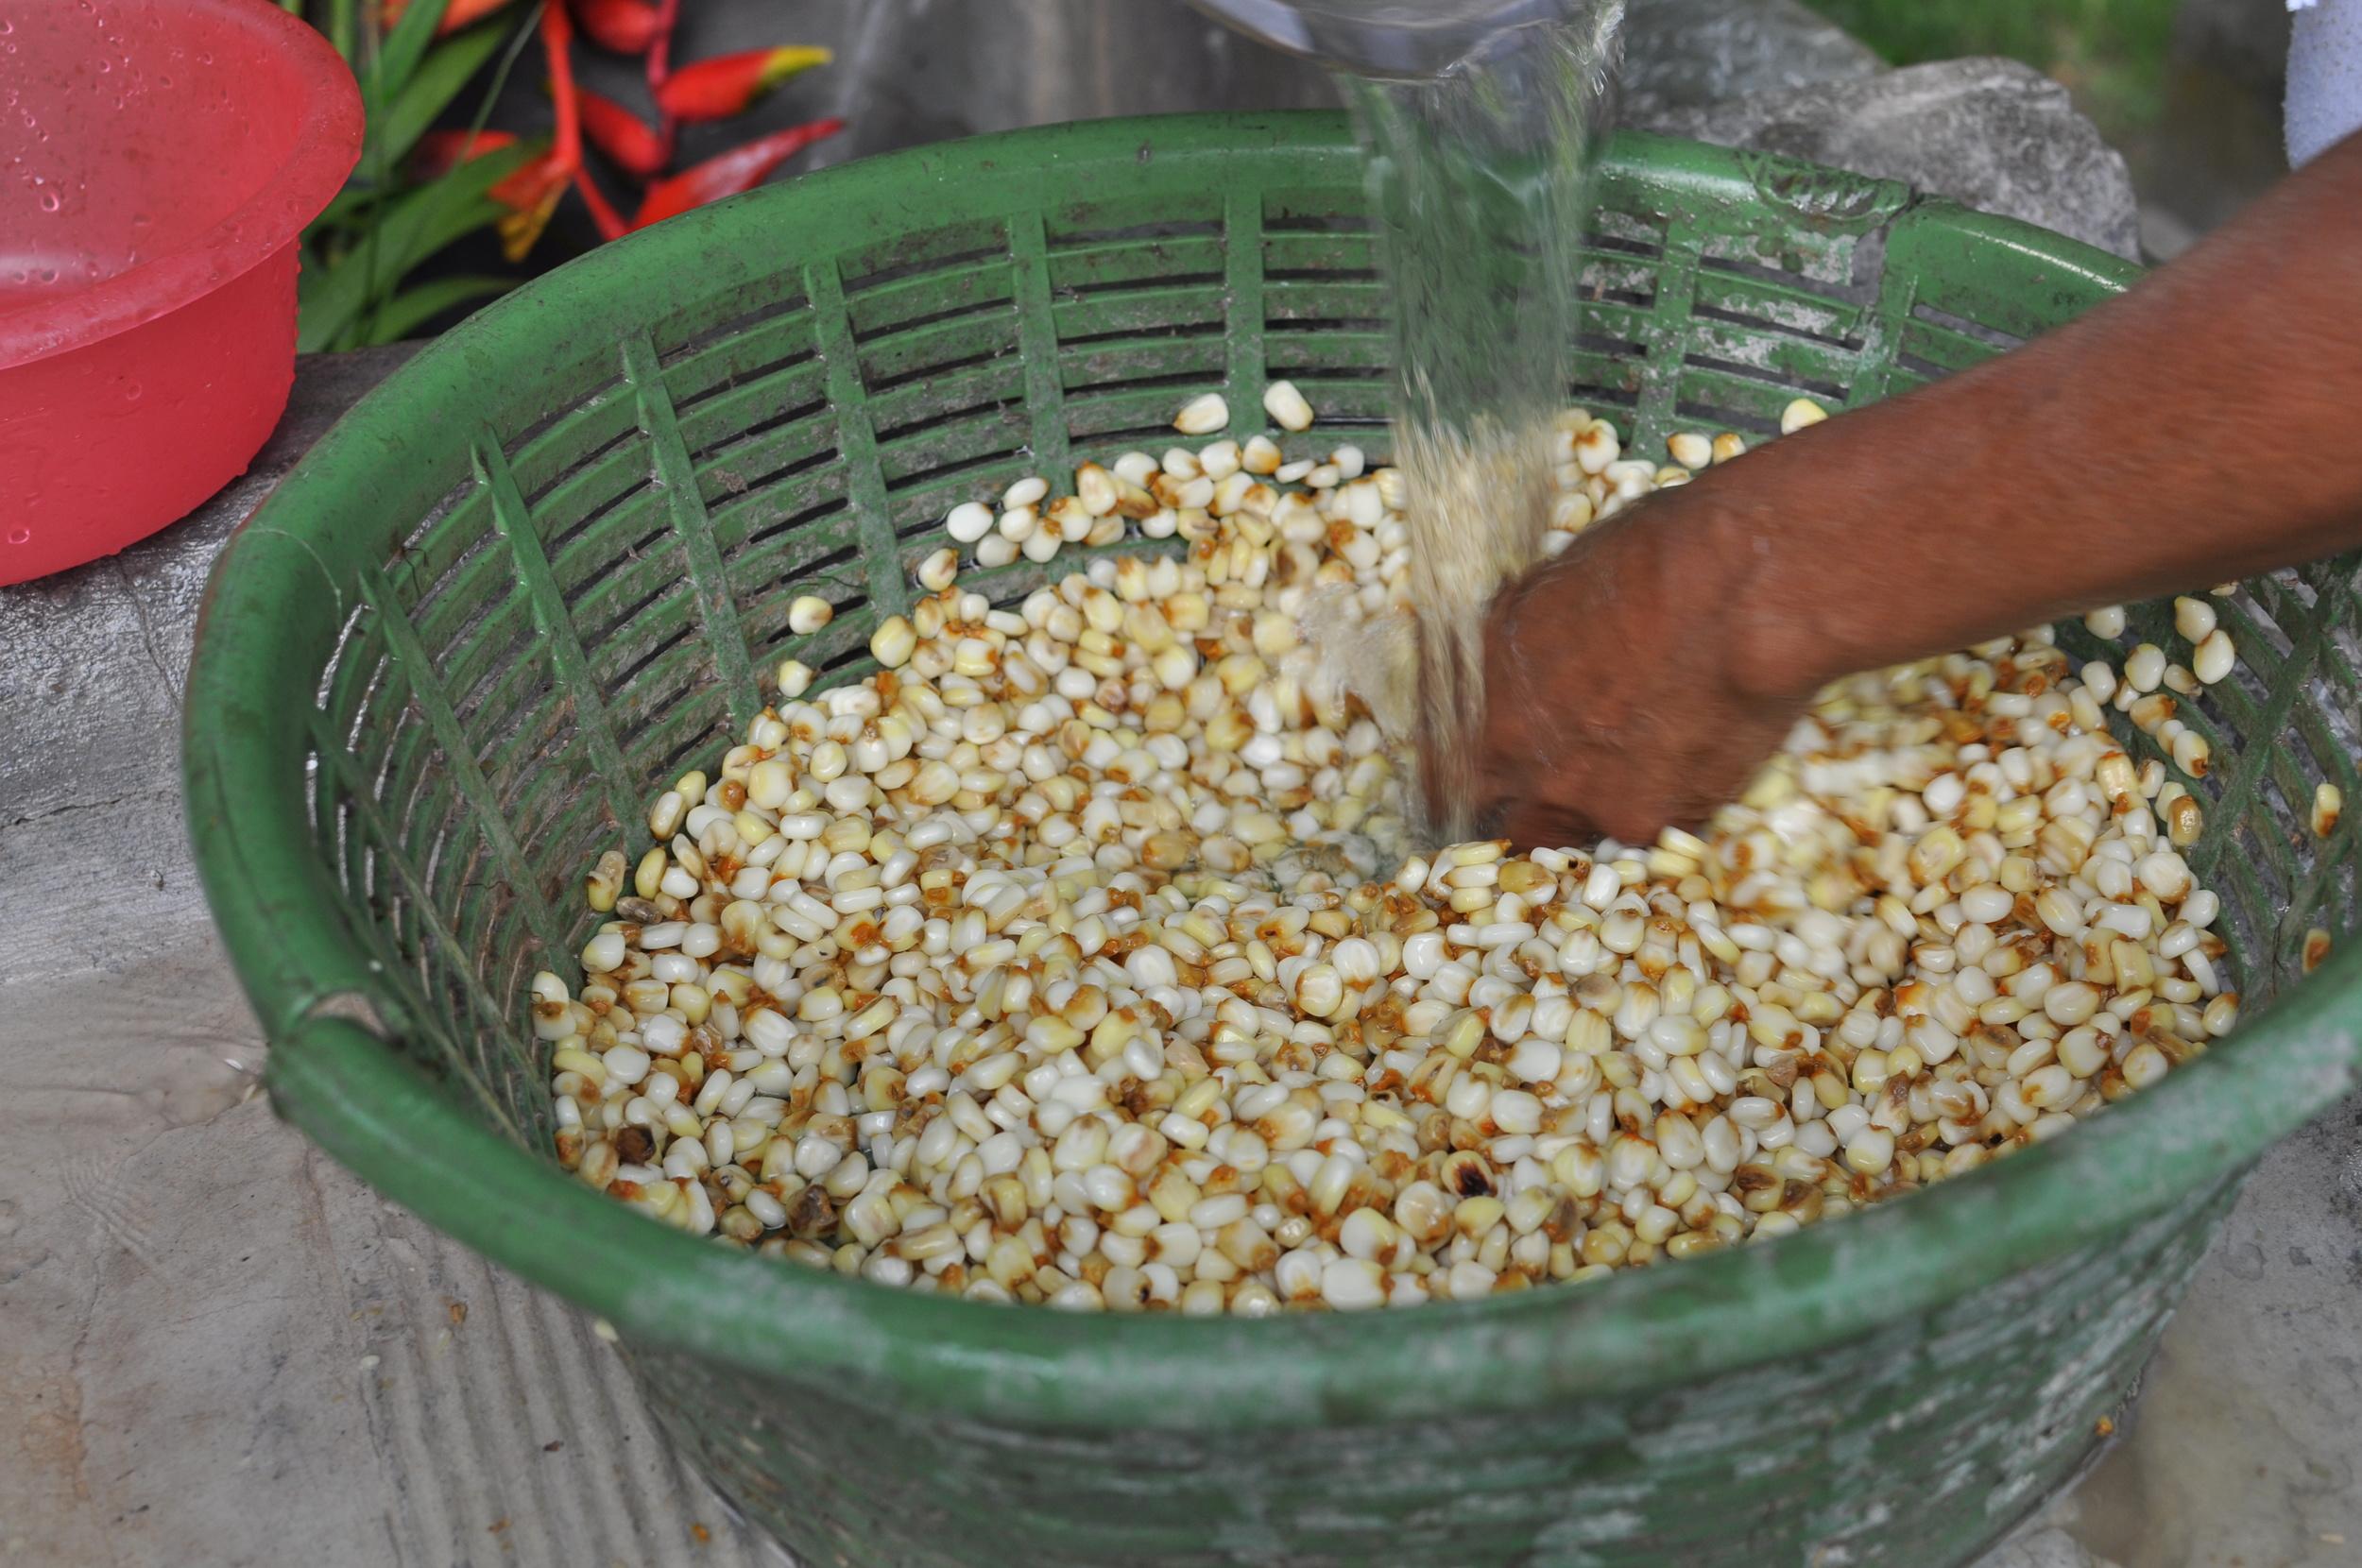 Washing the corn